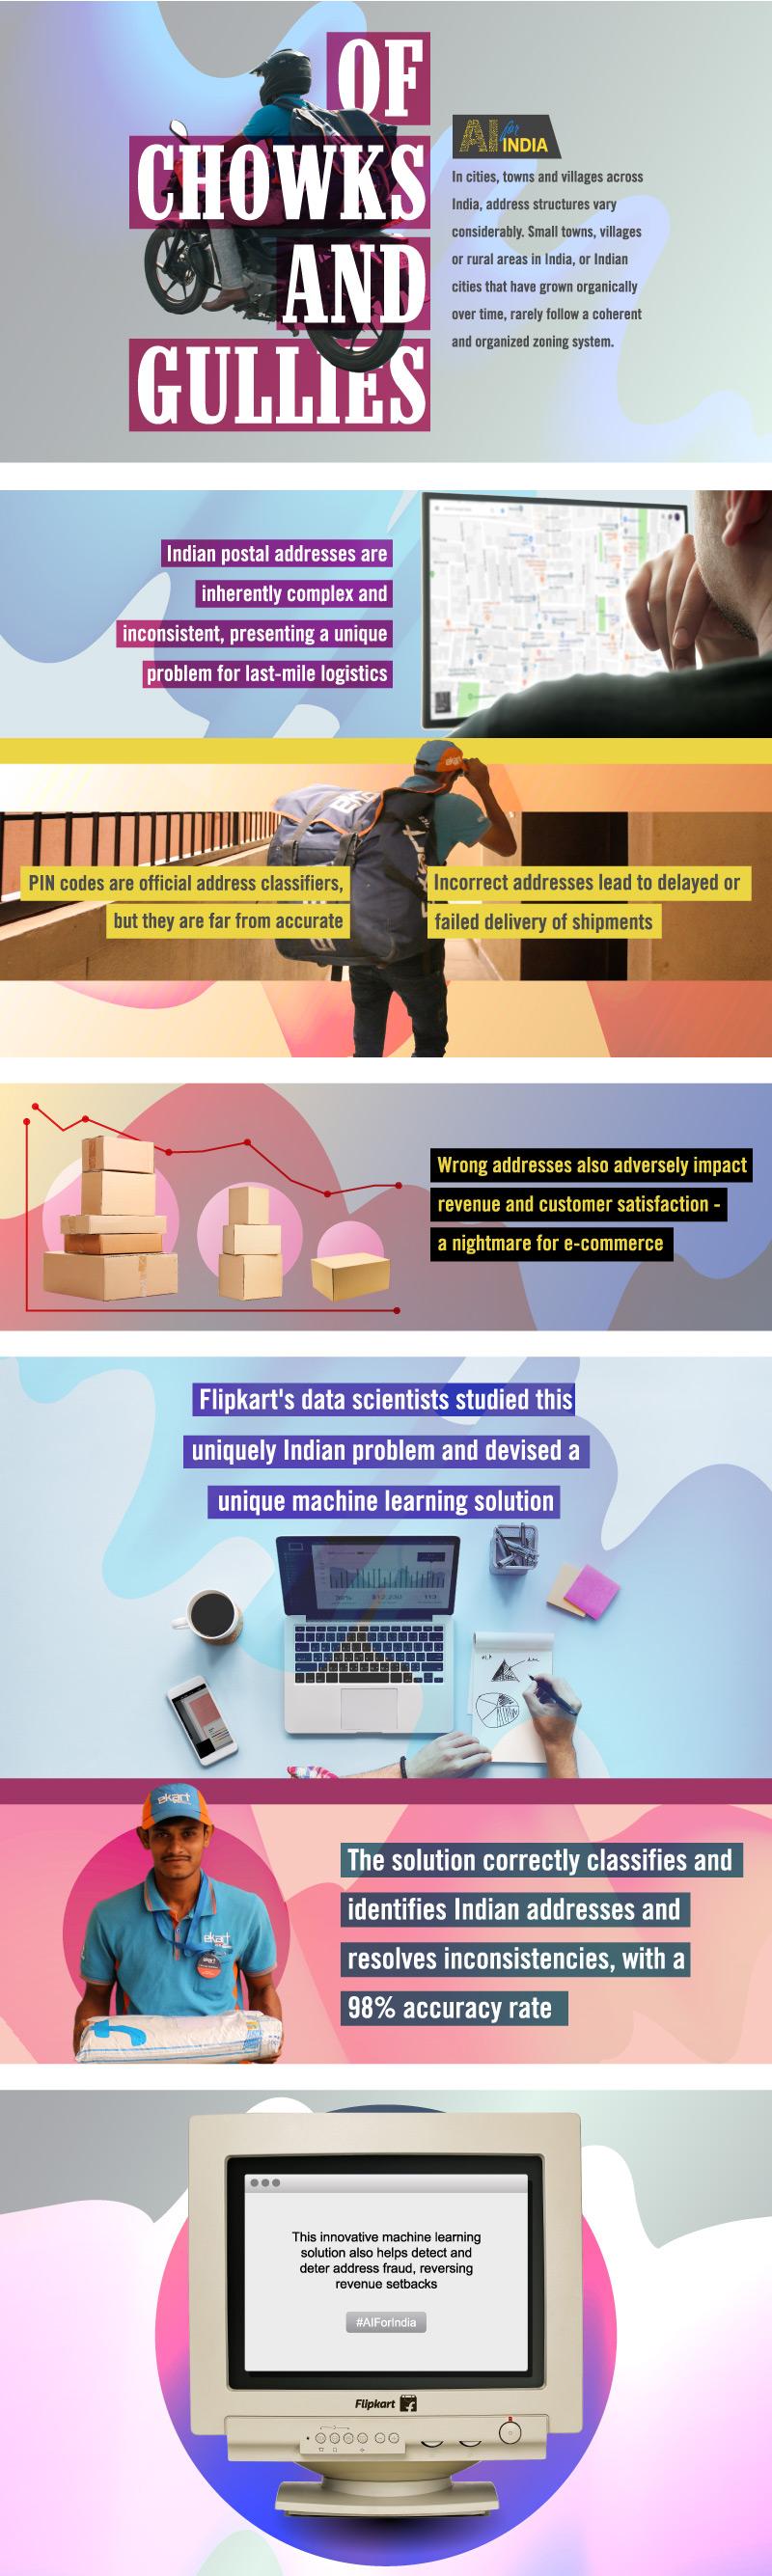 Indian Address AI ML Data Science Dr Ravindra Babu Address Infographic